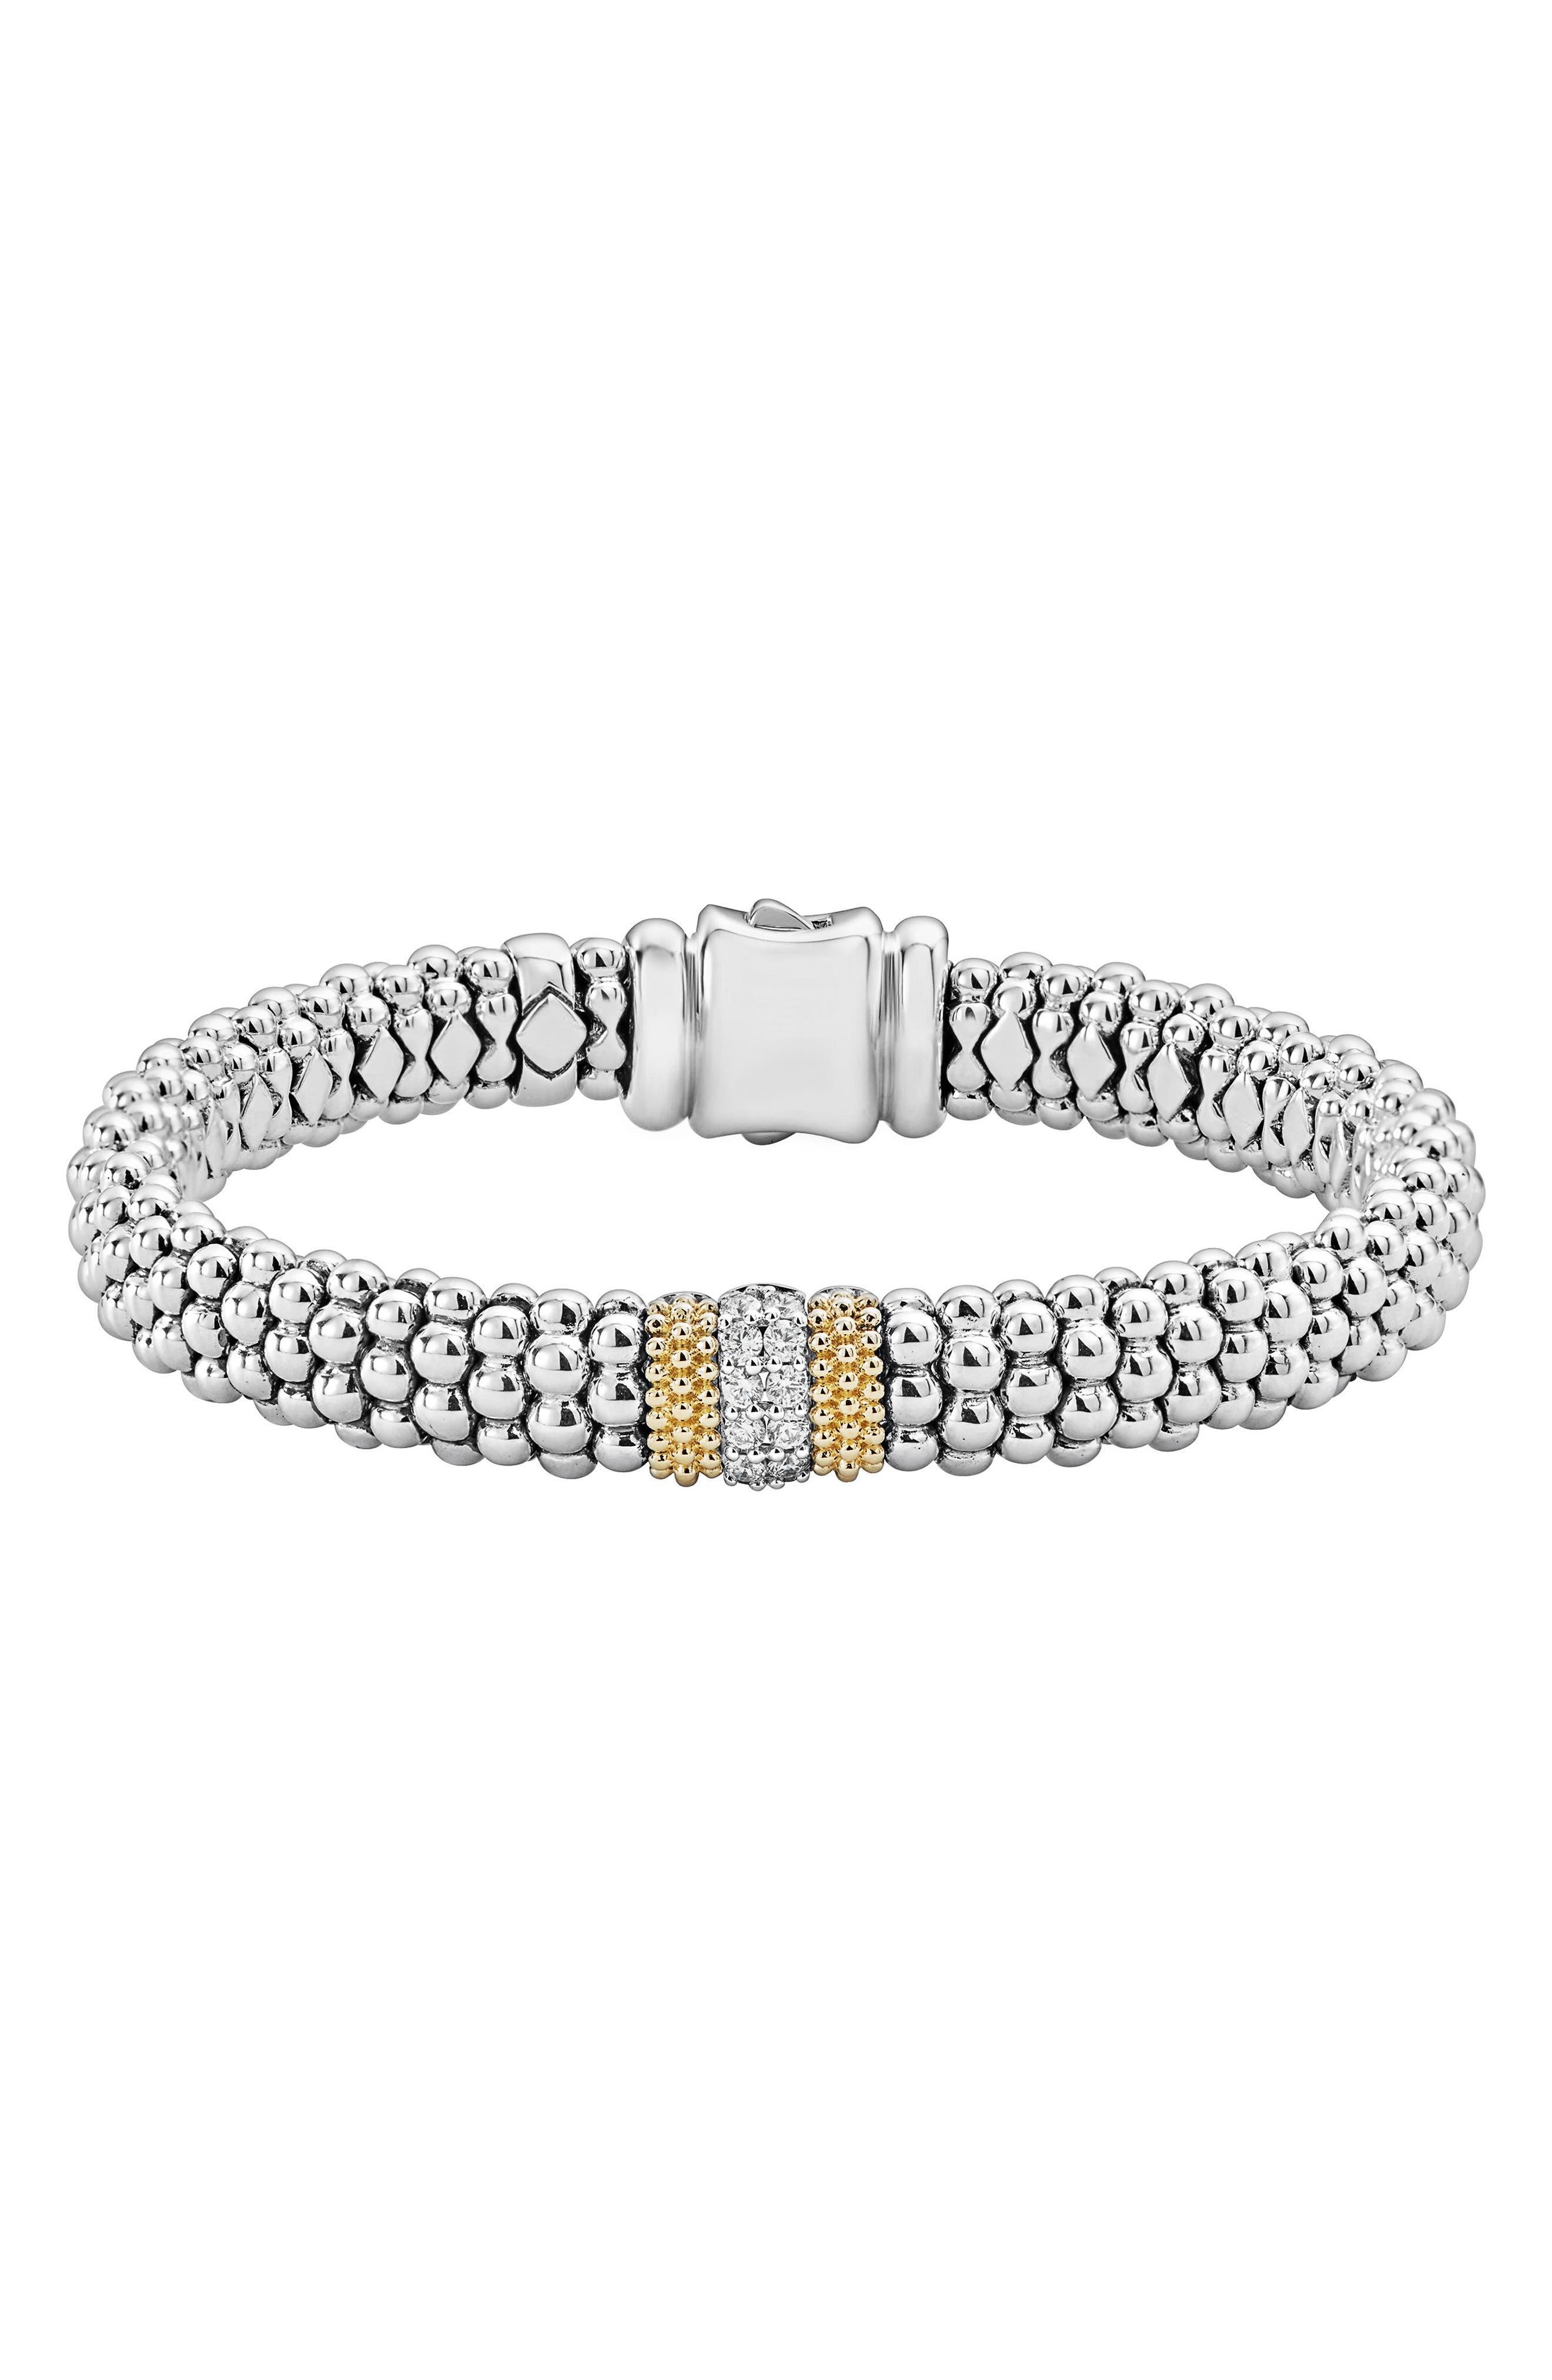 Luxe Pavé Diamond 9mm Bracelet,                             Main thumbnail 1, color,                             Diamond 2